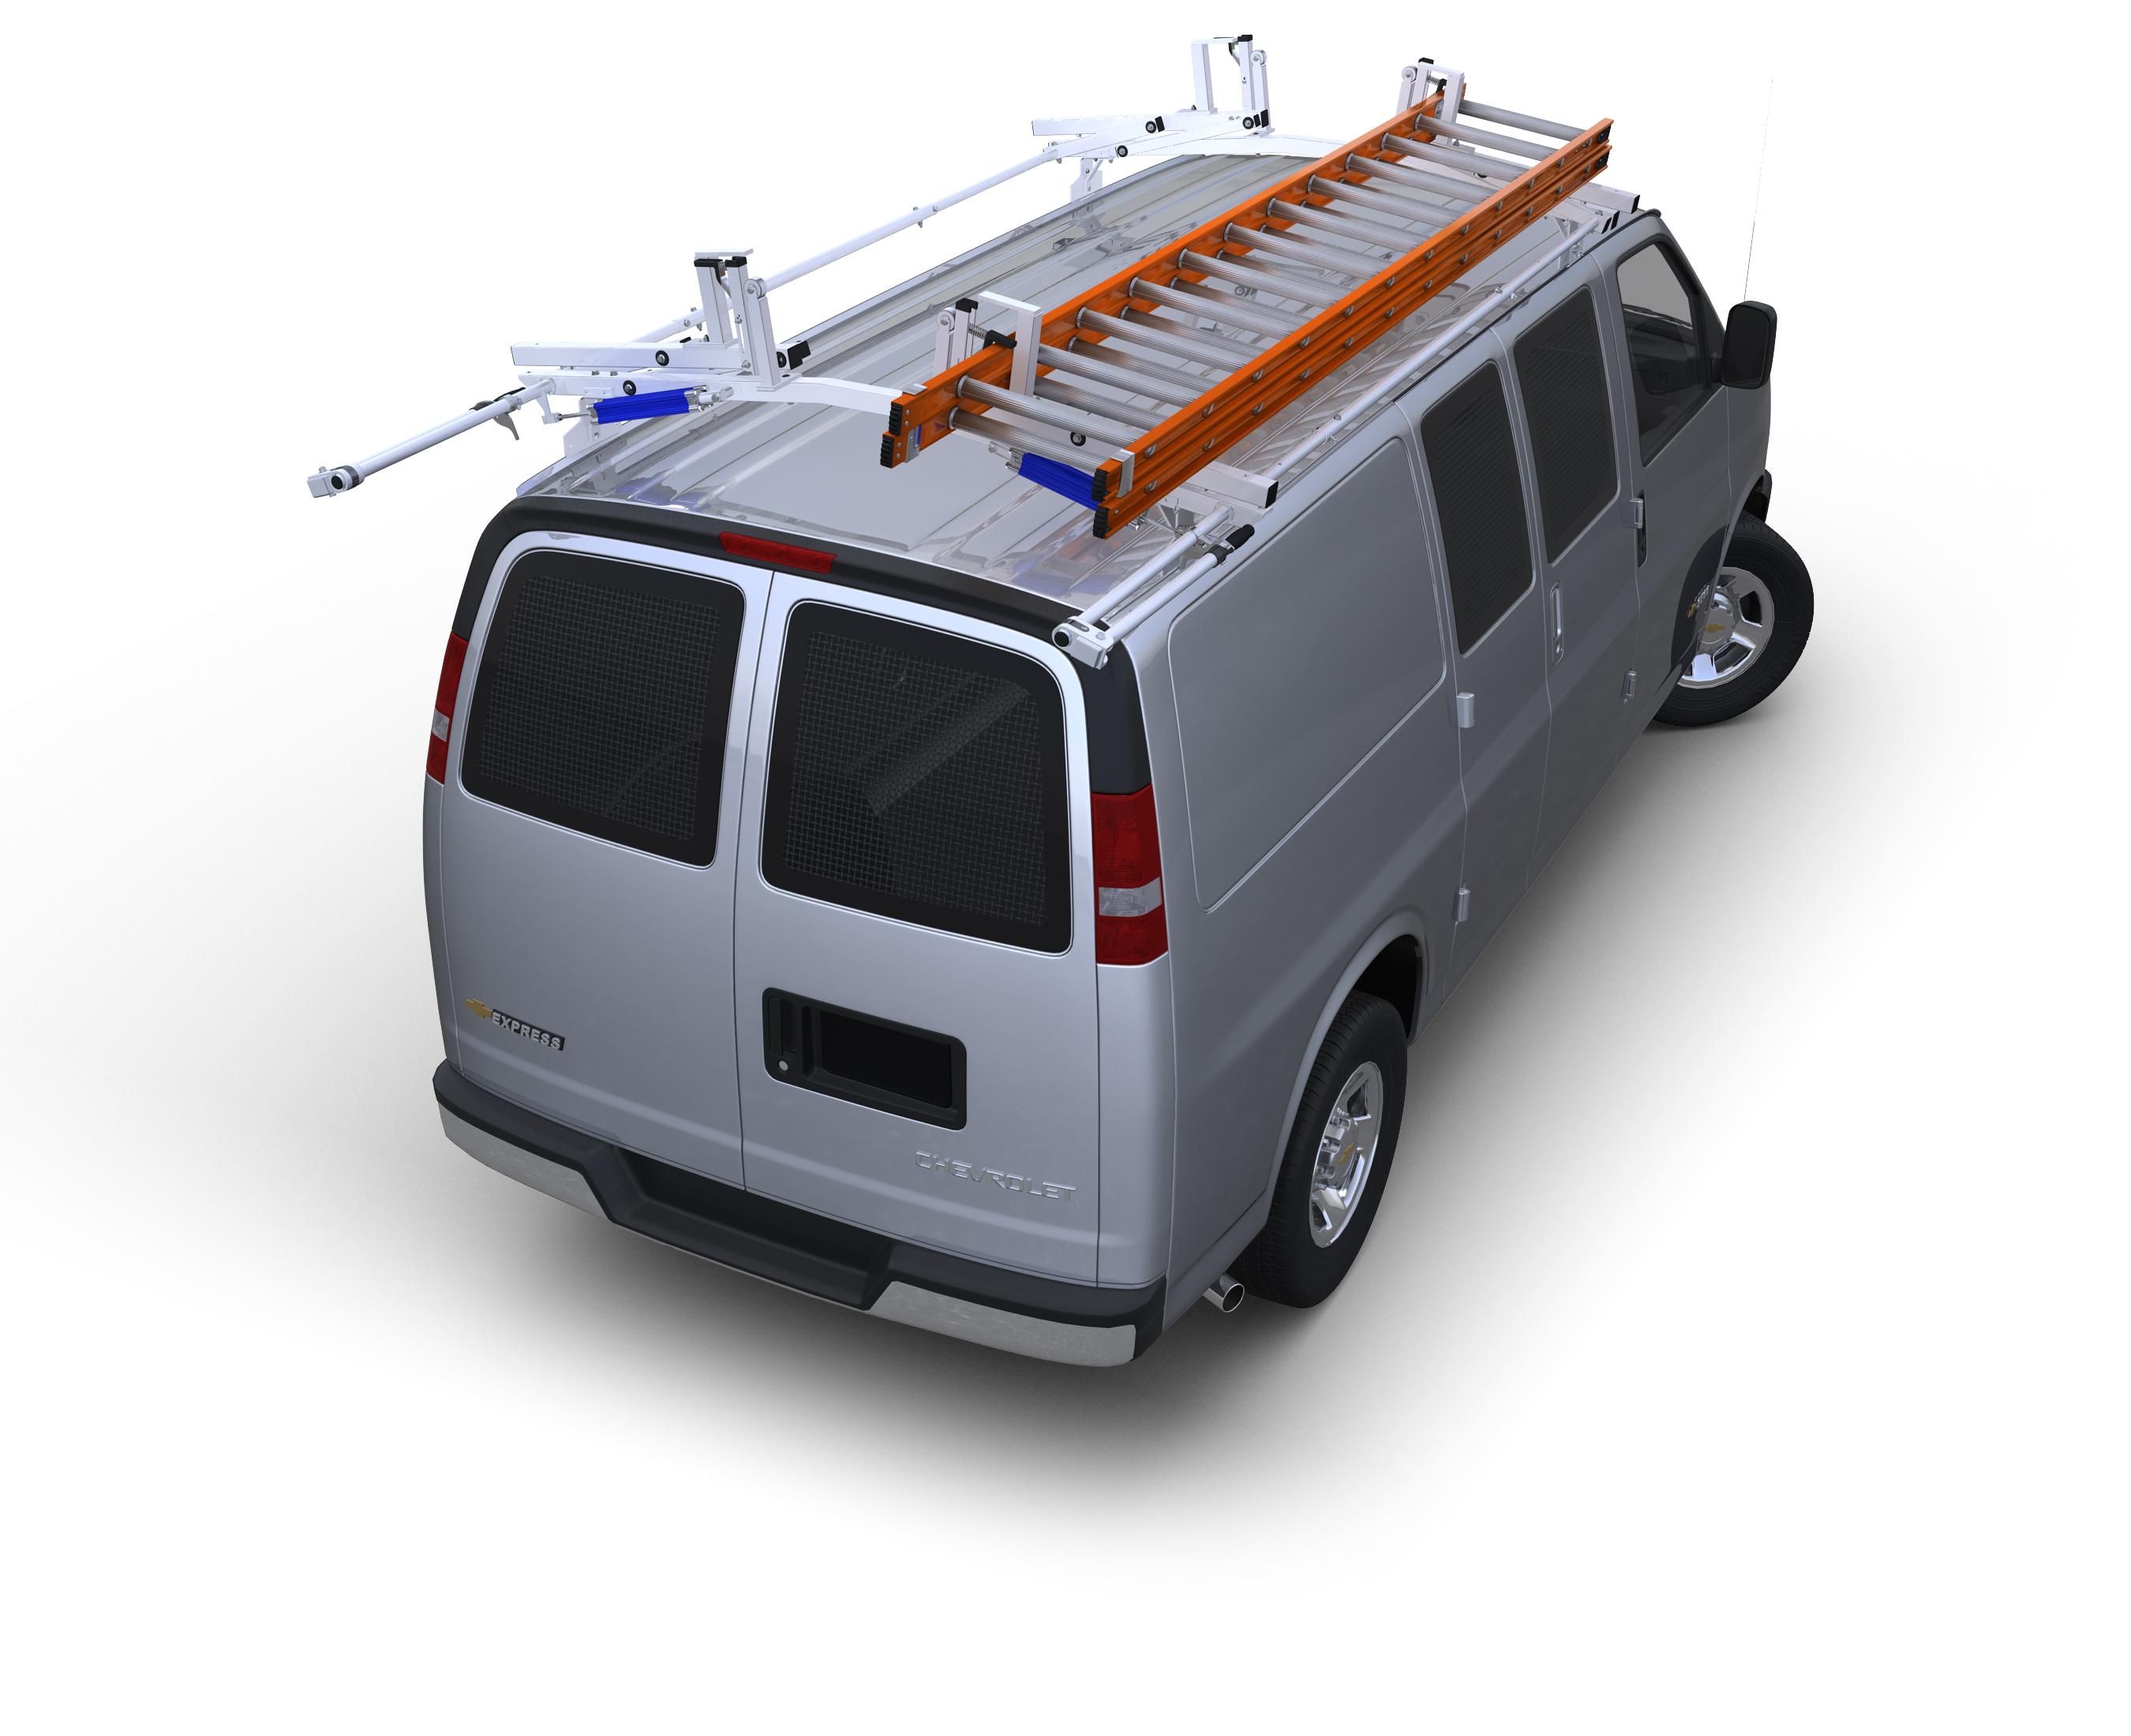 36-Bin Storage Cabinet 36-Bin Storage -CHU-36-800  sc 1 st  American Van & 36-Bin Storage Cabinet - American Van